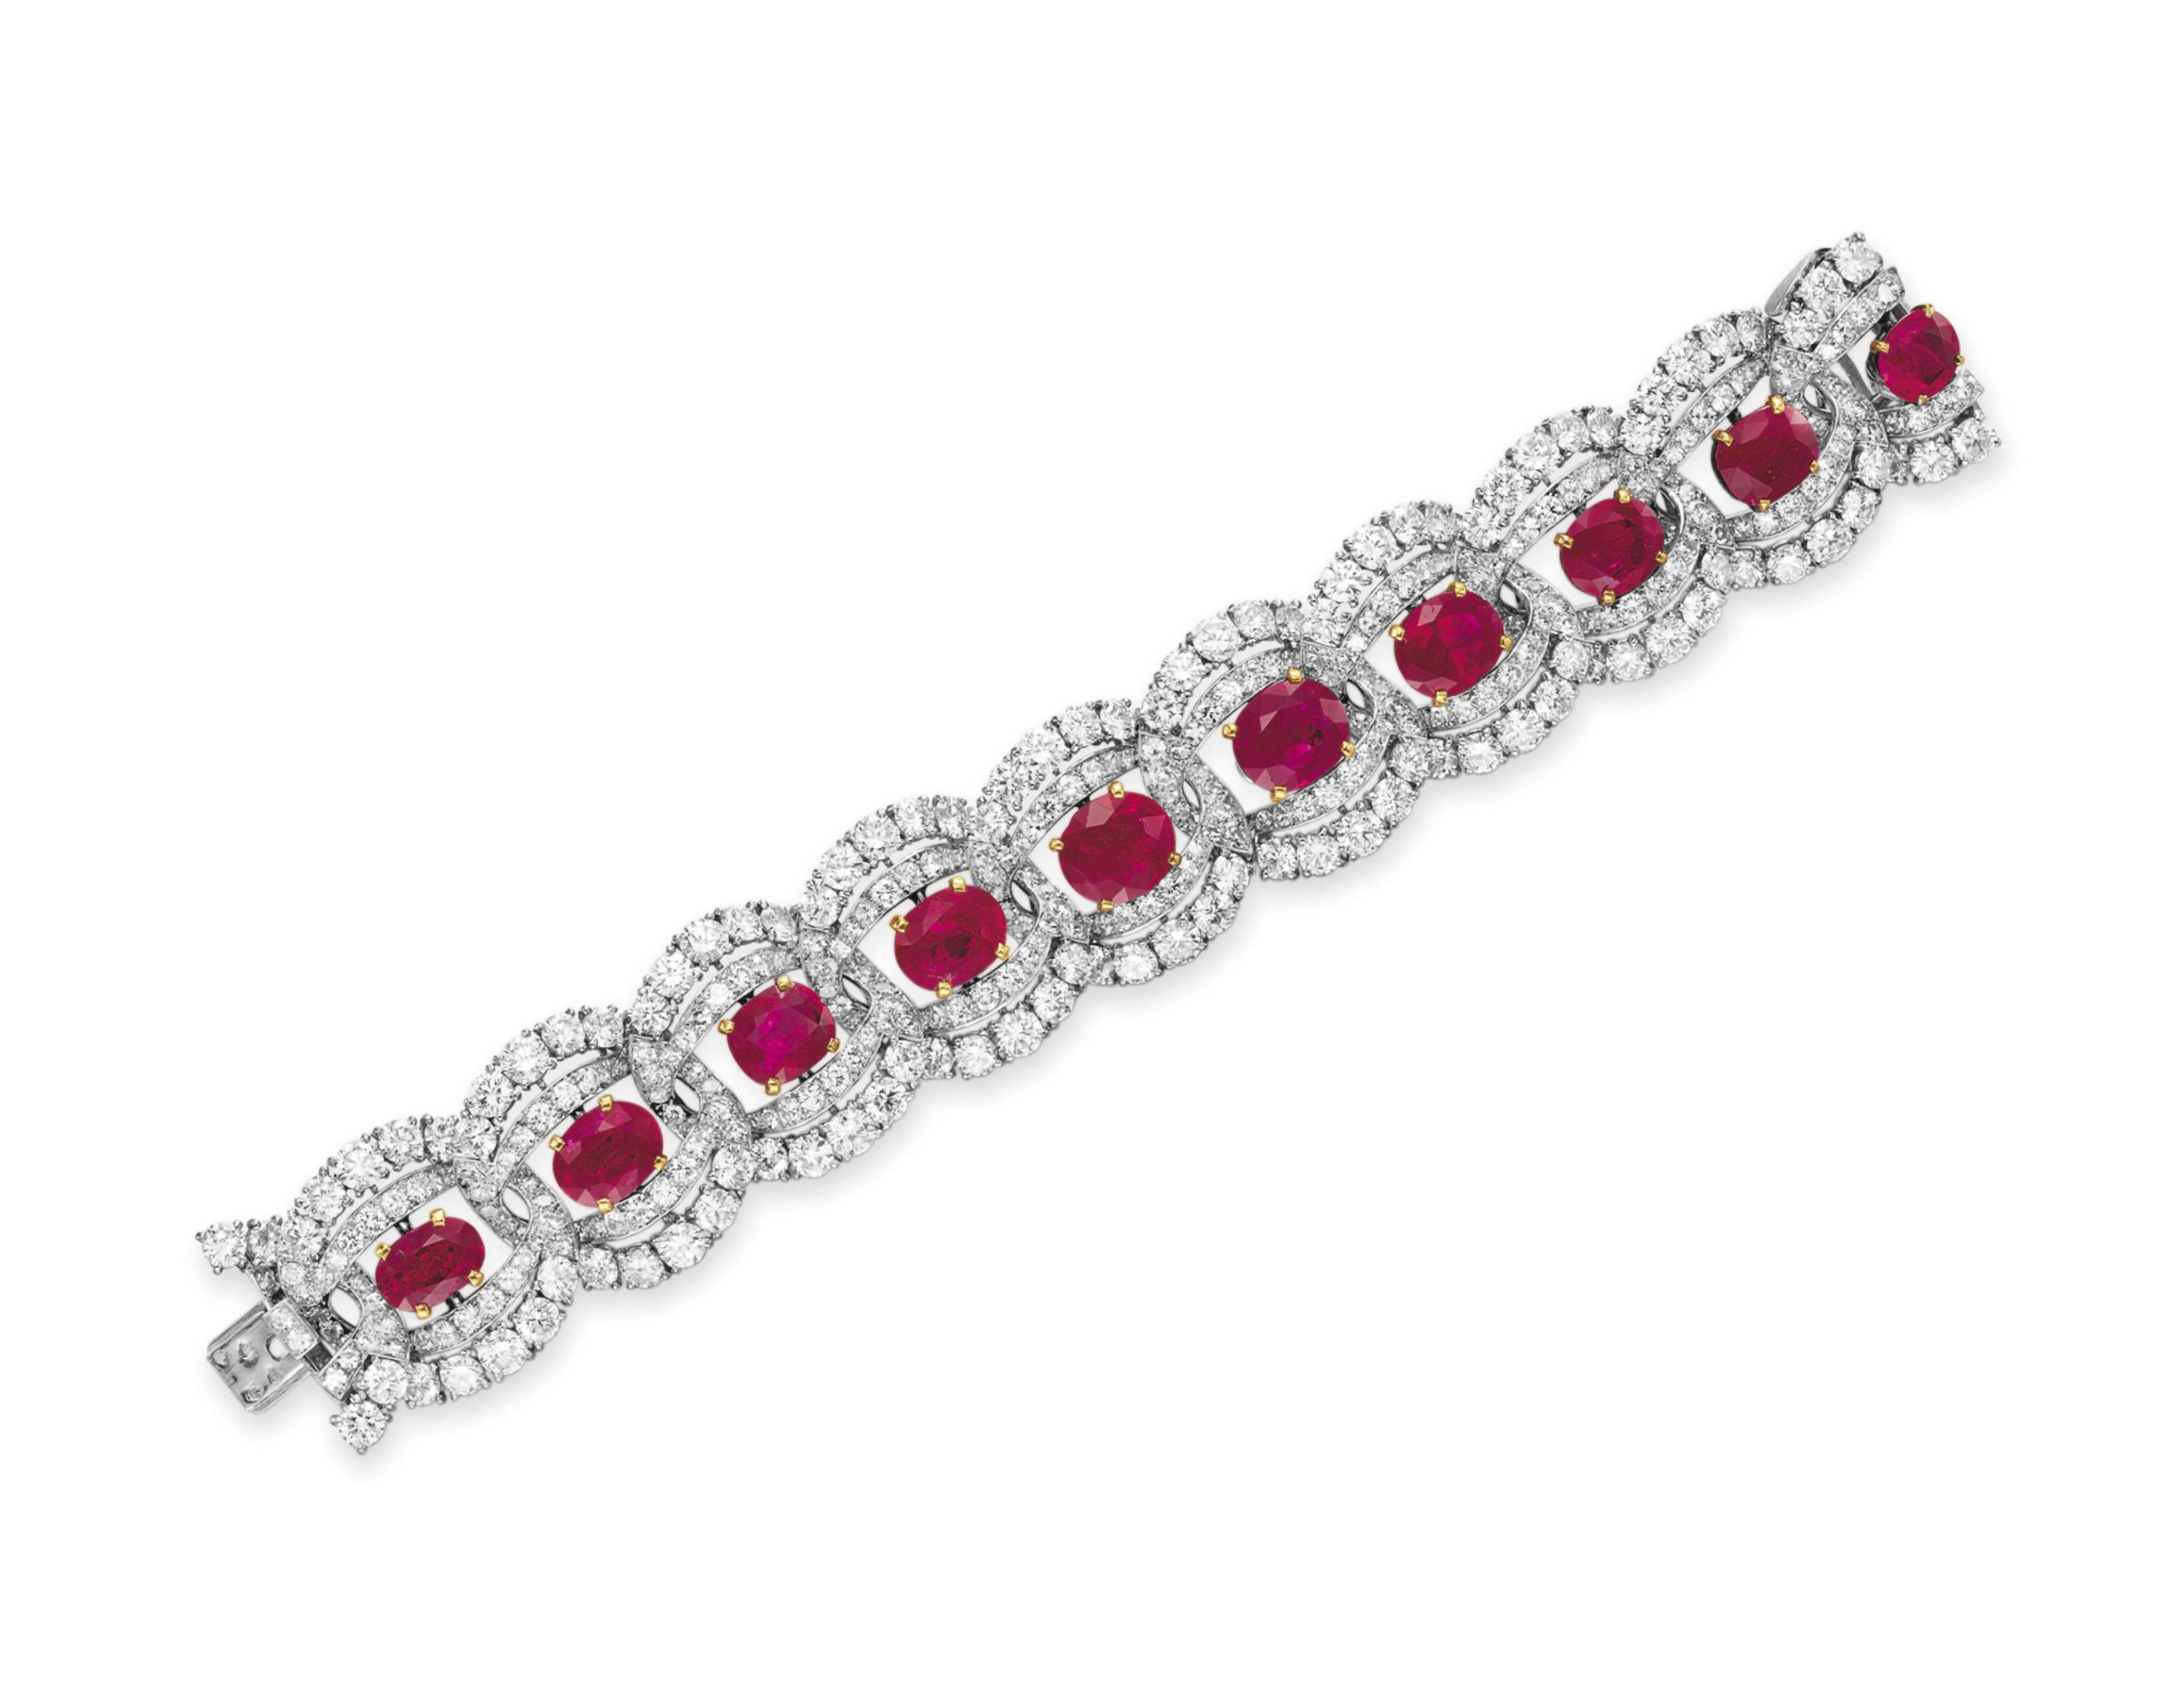 A RUBY AND DIAMOND BRACELET, BY CARTIER